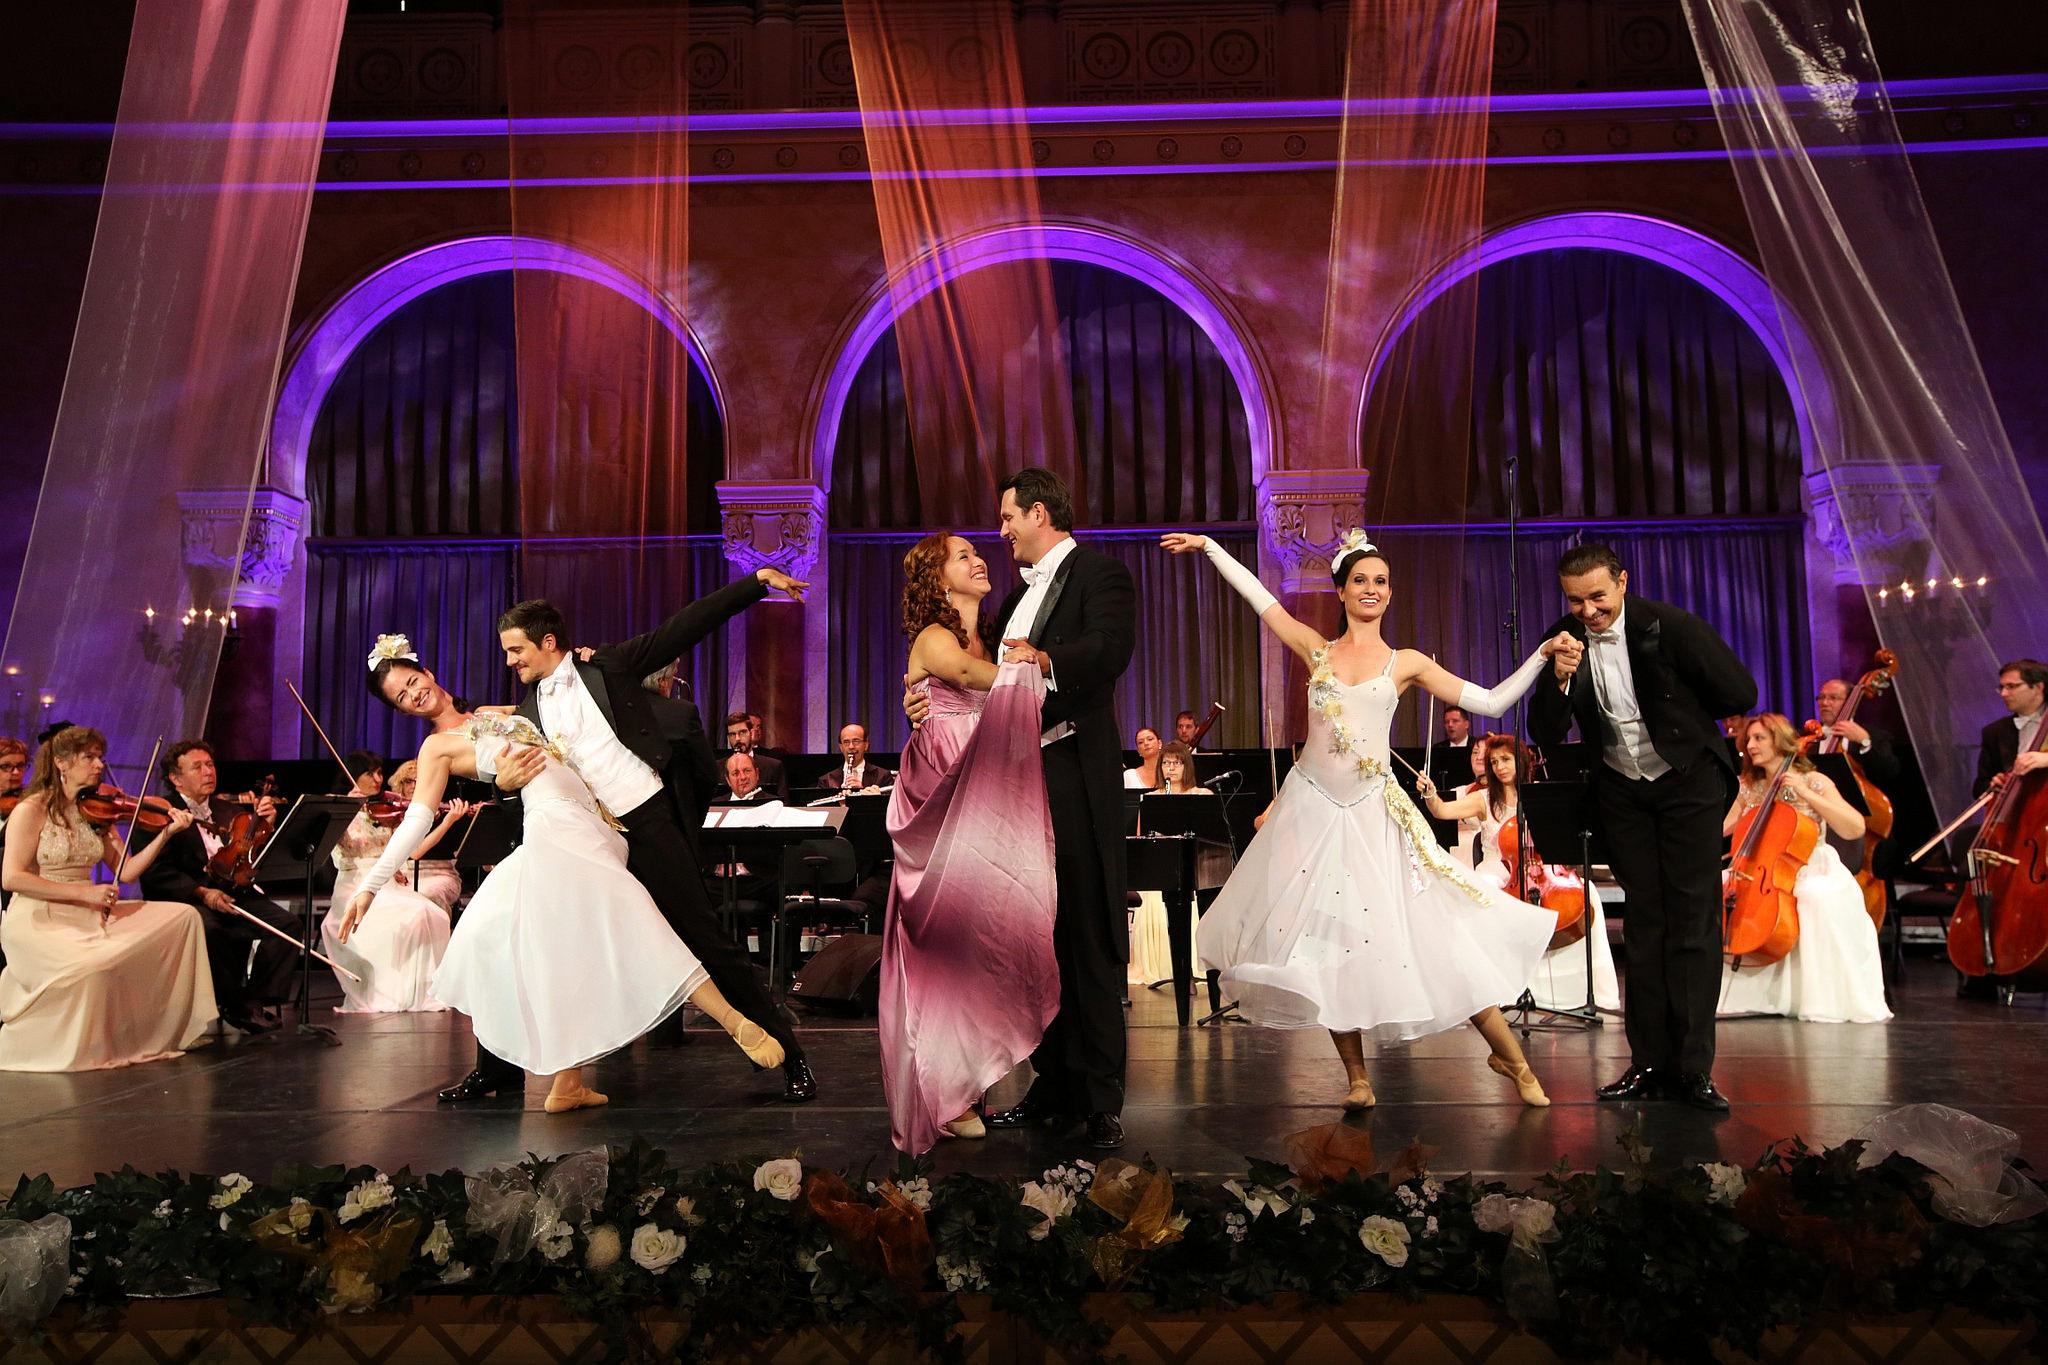 budapest-galakoncert-klasszikus-zenei-eloadas-operett-es-balett-elemekkelgala-concert-original-83388.jpg